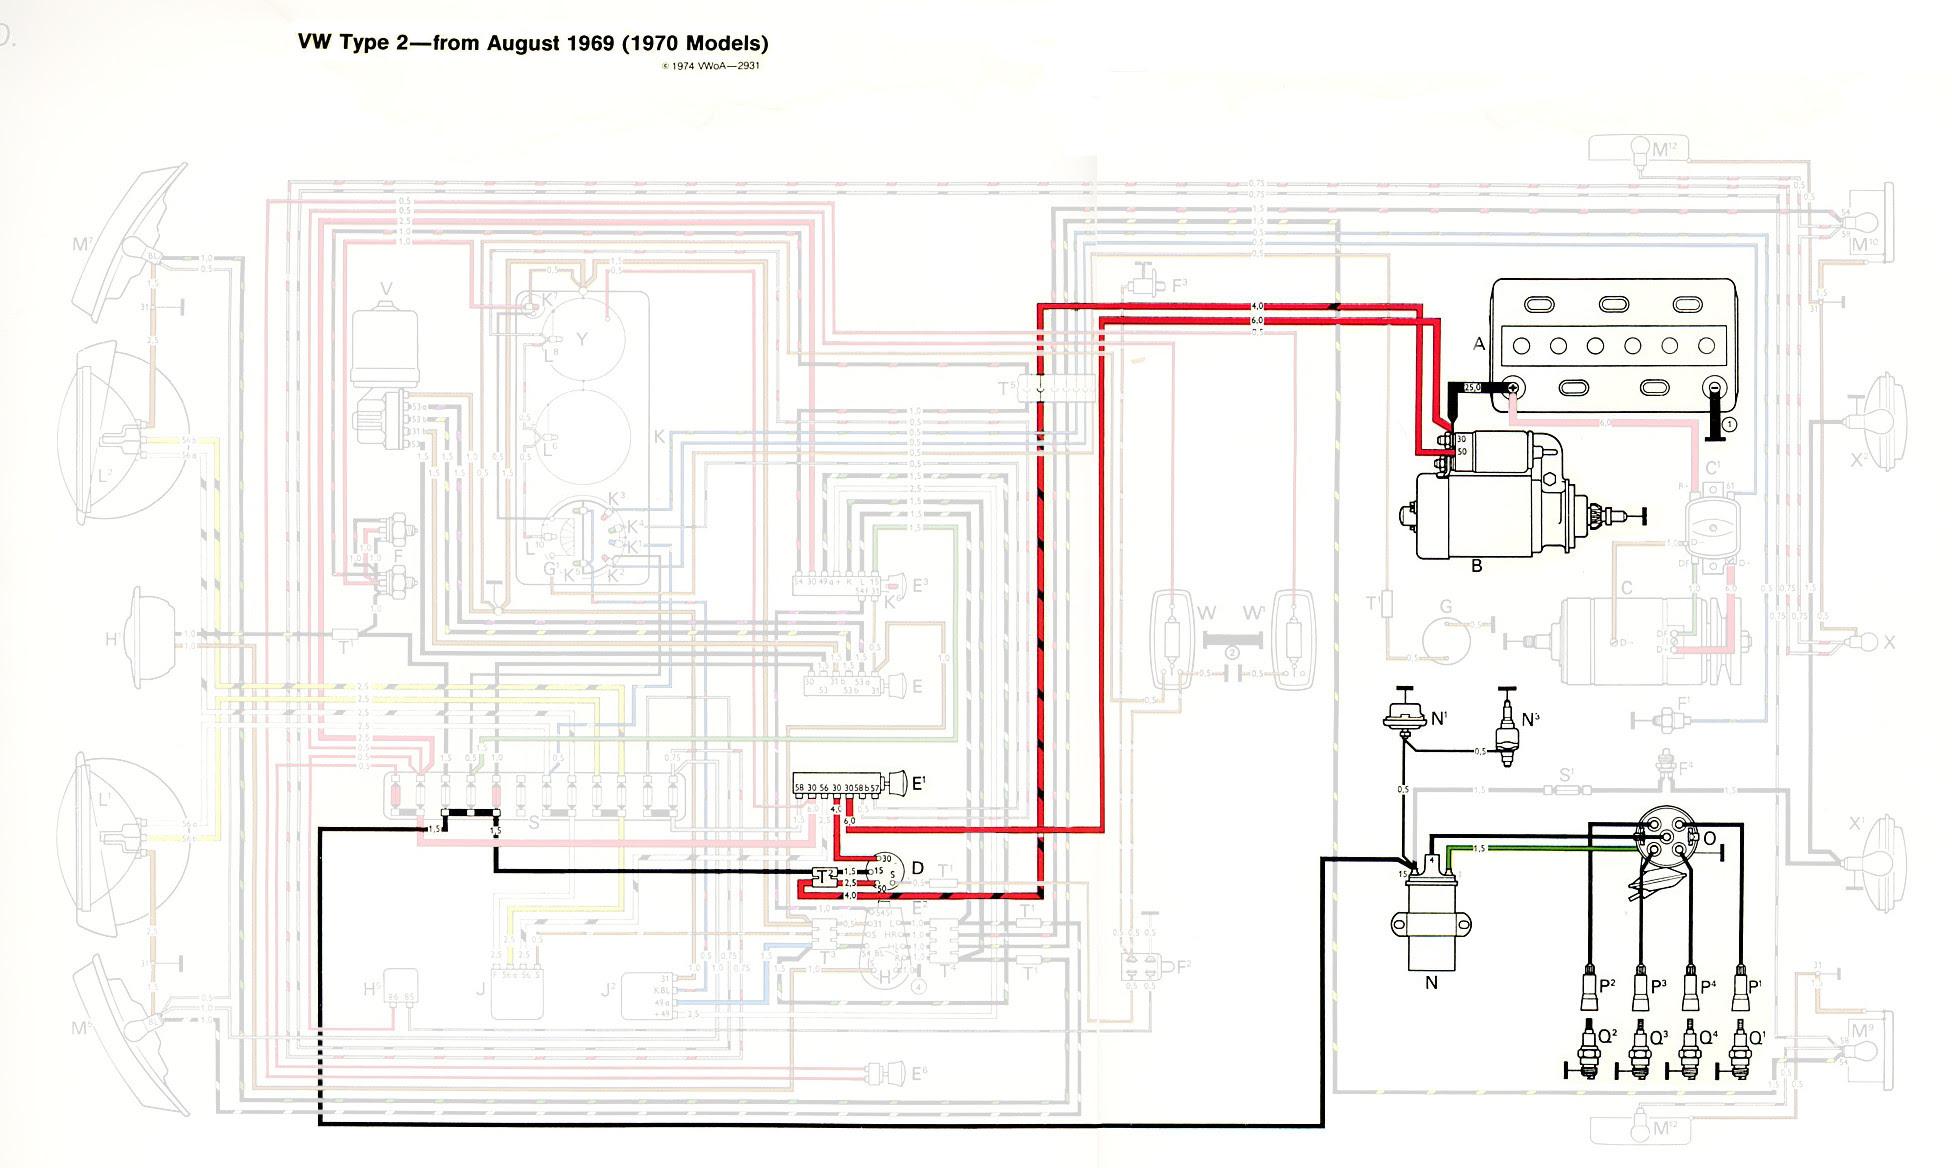 Diagram 1972 Vw Bus Ignintion Wiring Diagram Full Version Hd Quality Wiring Diagram Spaschematics Corrierte It